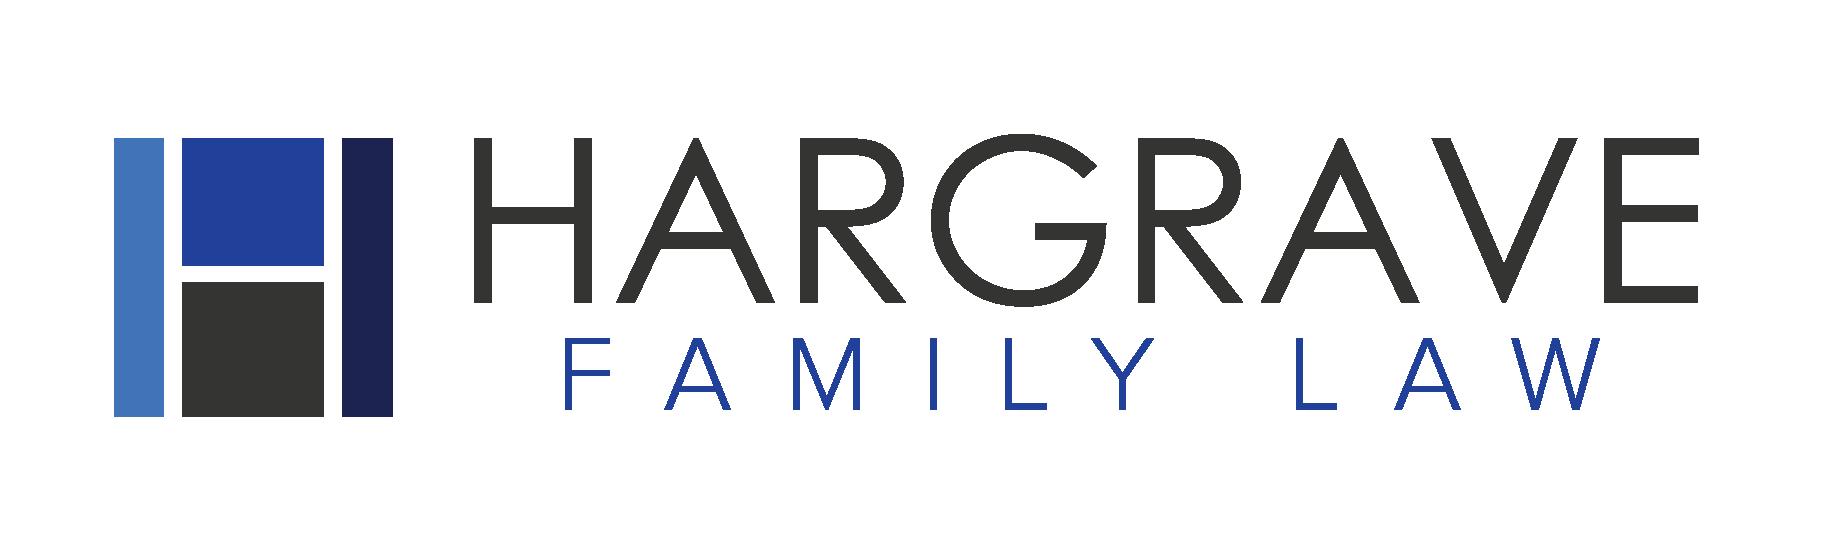 Hargrave Family Law logo